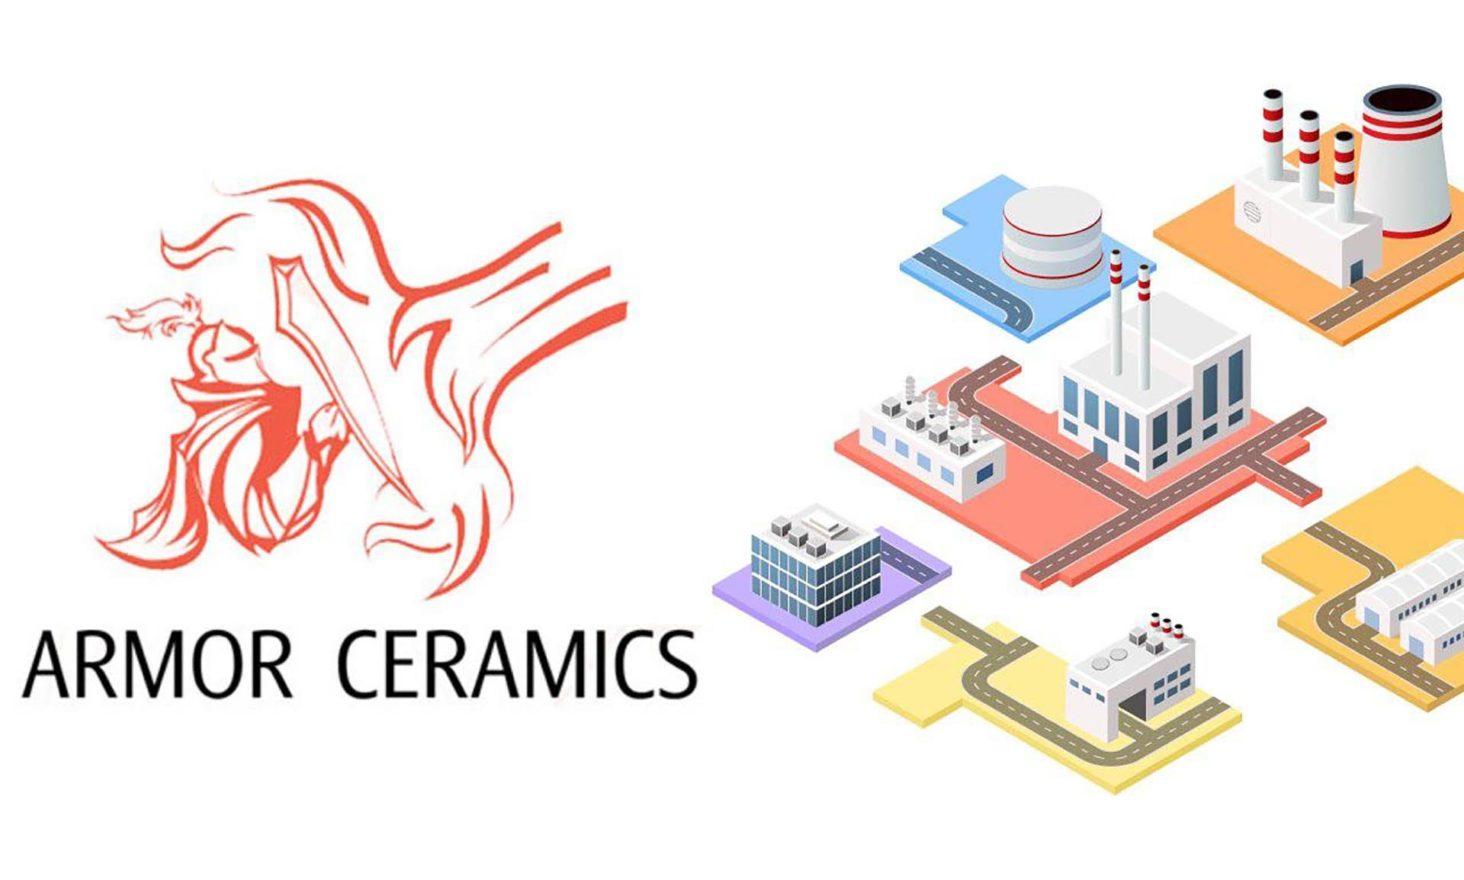 Armor Ceramics Launches Pre-ICO for Blockchain-Based Self Sufficiency in Ukraine's Heavy Industry